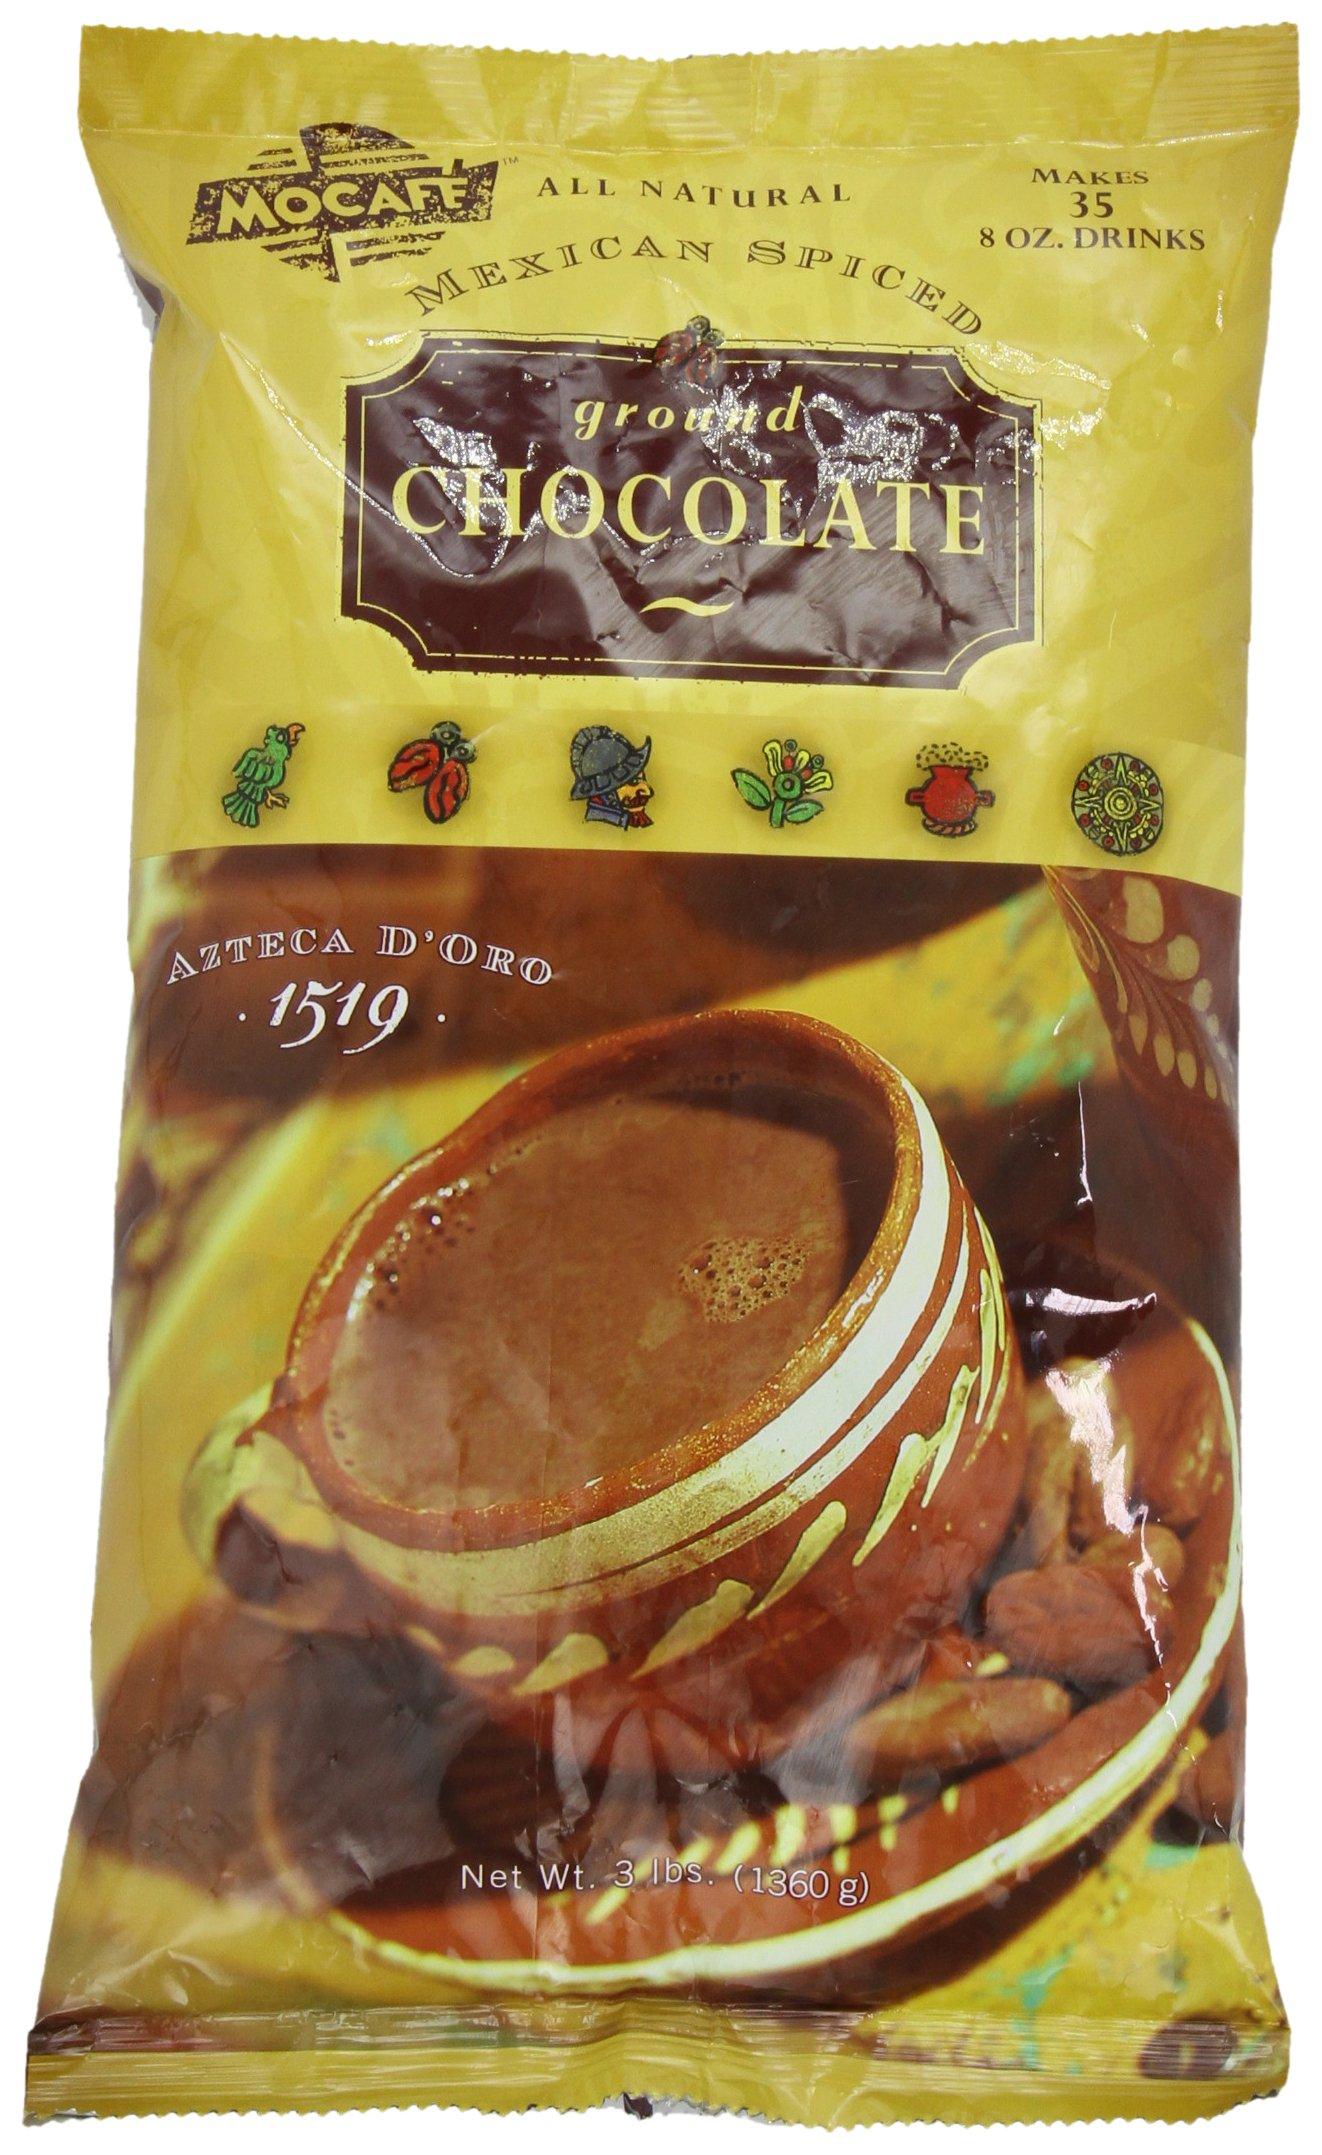 Mocafe Azteca Doro 1519 Mexican Spiced Ground Chocolate, 3-Pound Bag